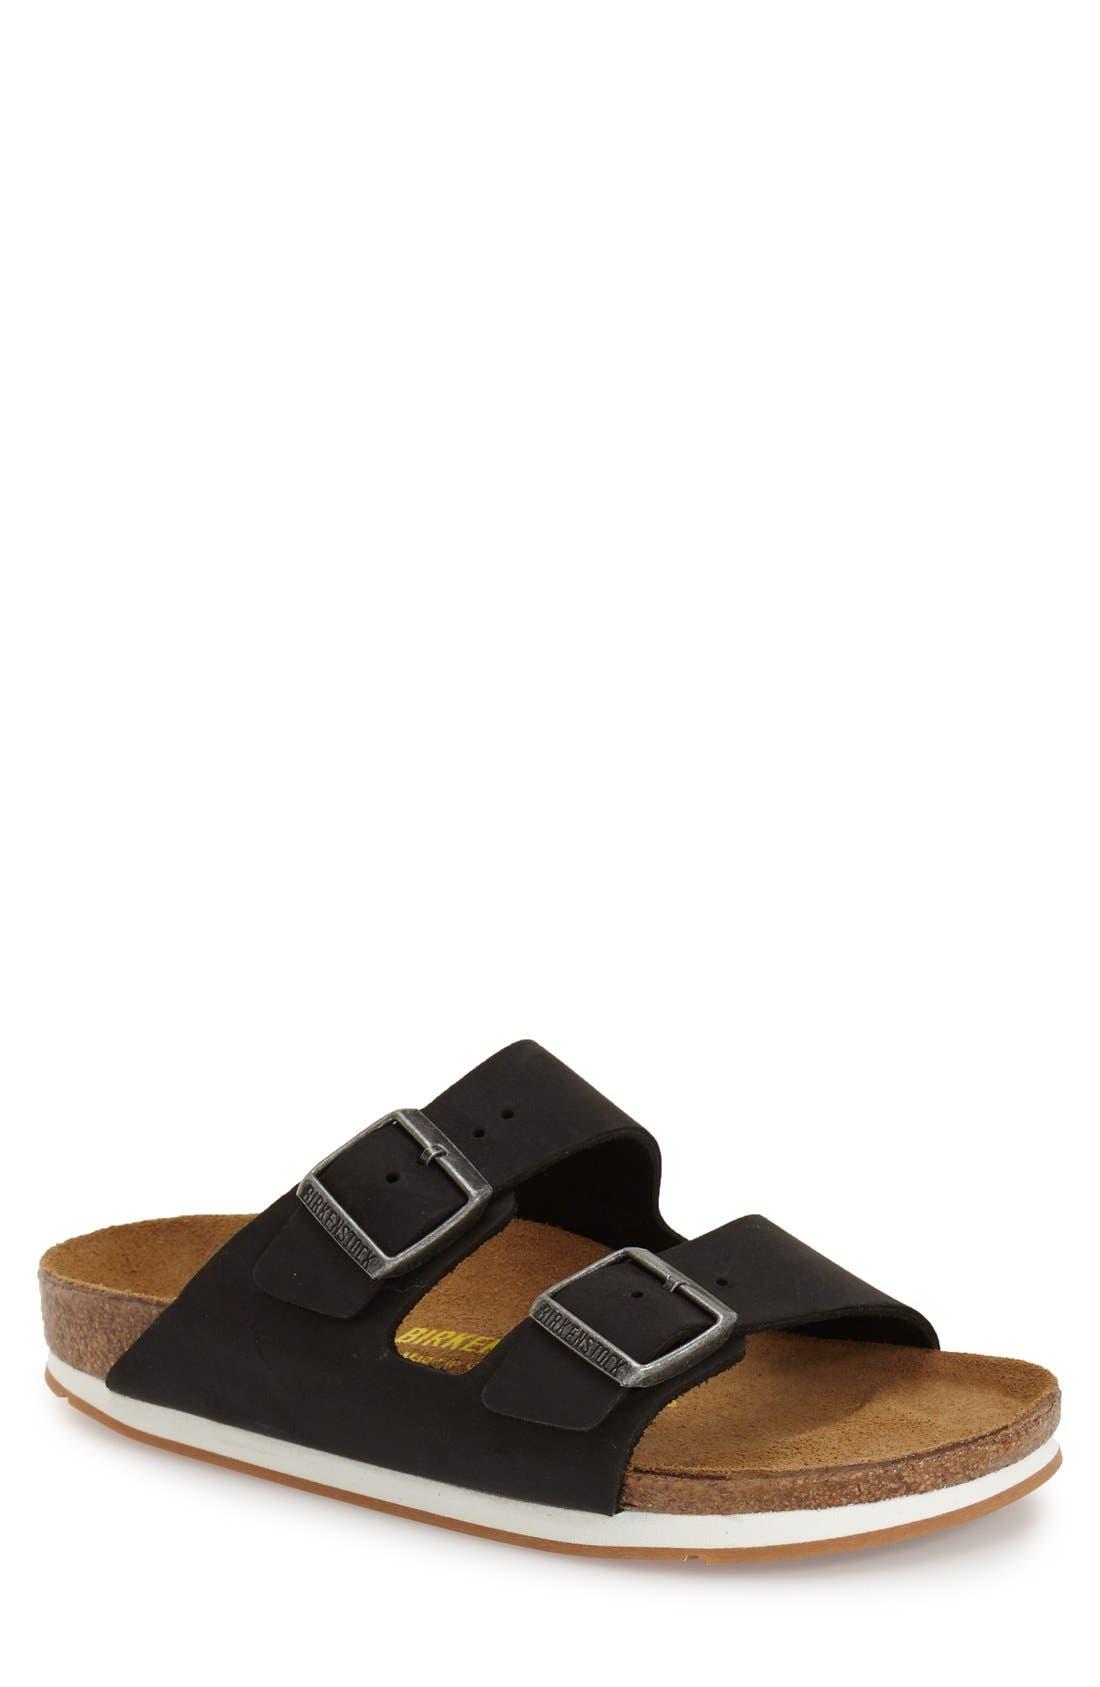 BIRKENSTOCK, 'Arizona' Leather Slide Sandal, Main thumbnail 1, color, 001